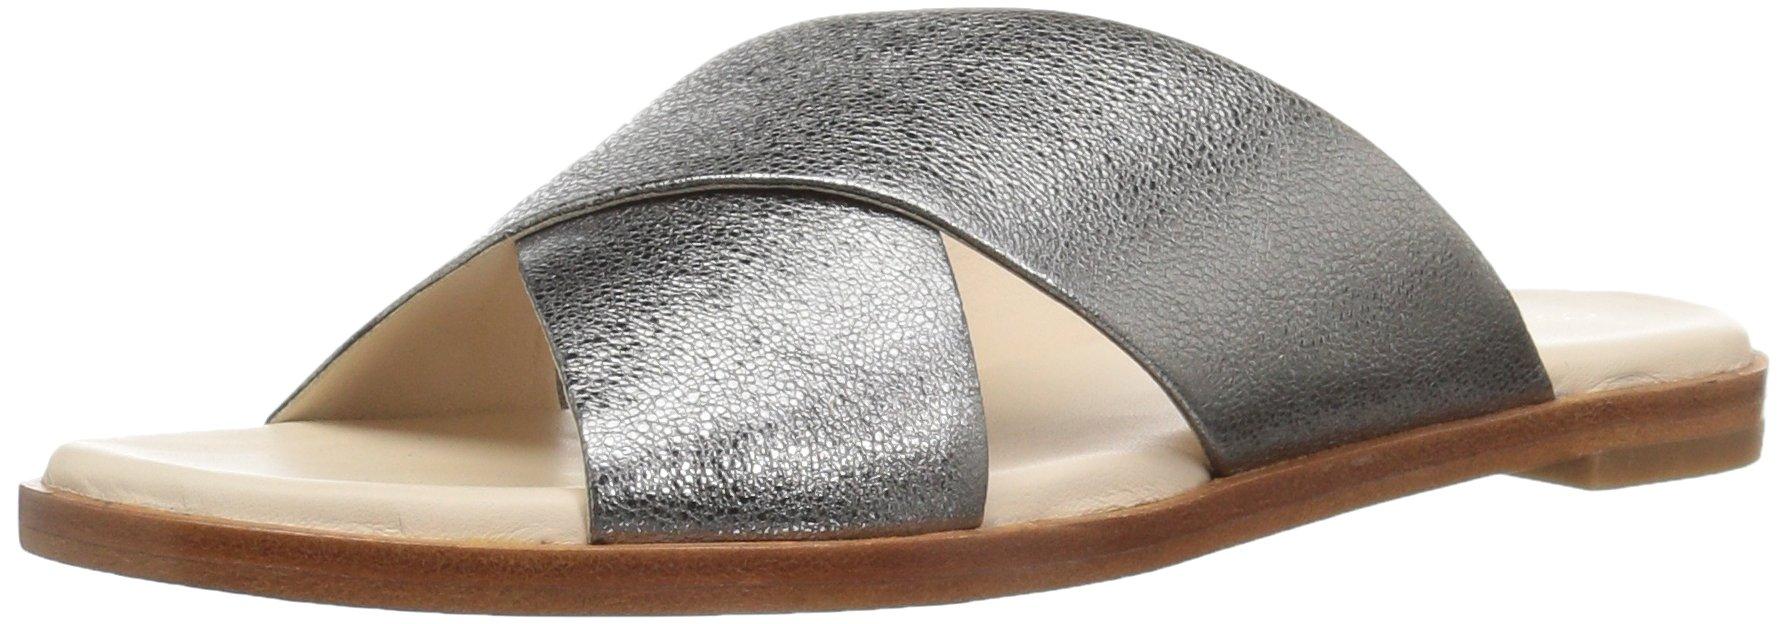 Cole Haan Women's Anica Criss Cross Sandal, Dark Grey, 10.5 B US